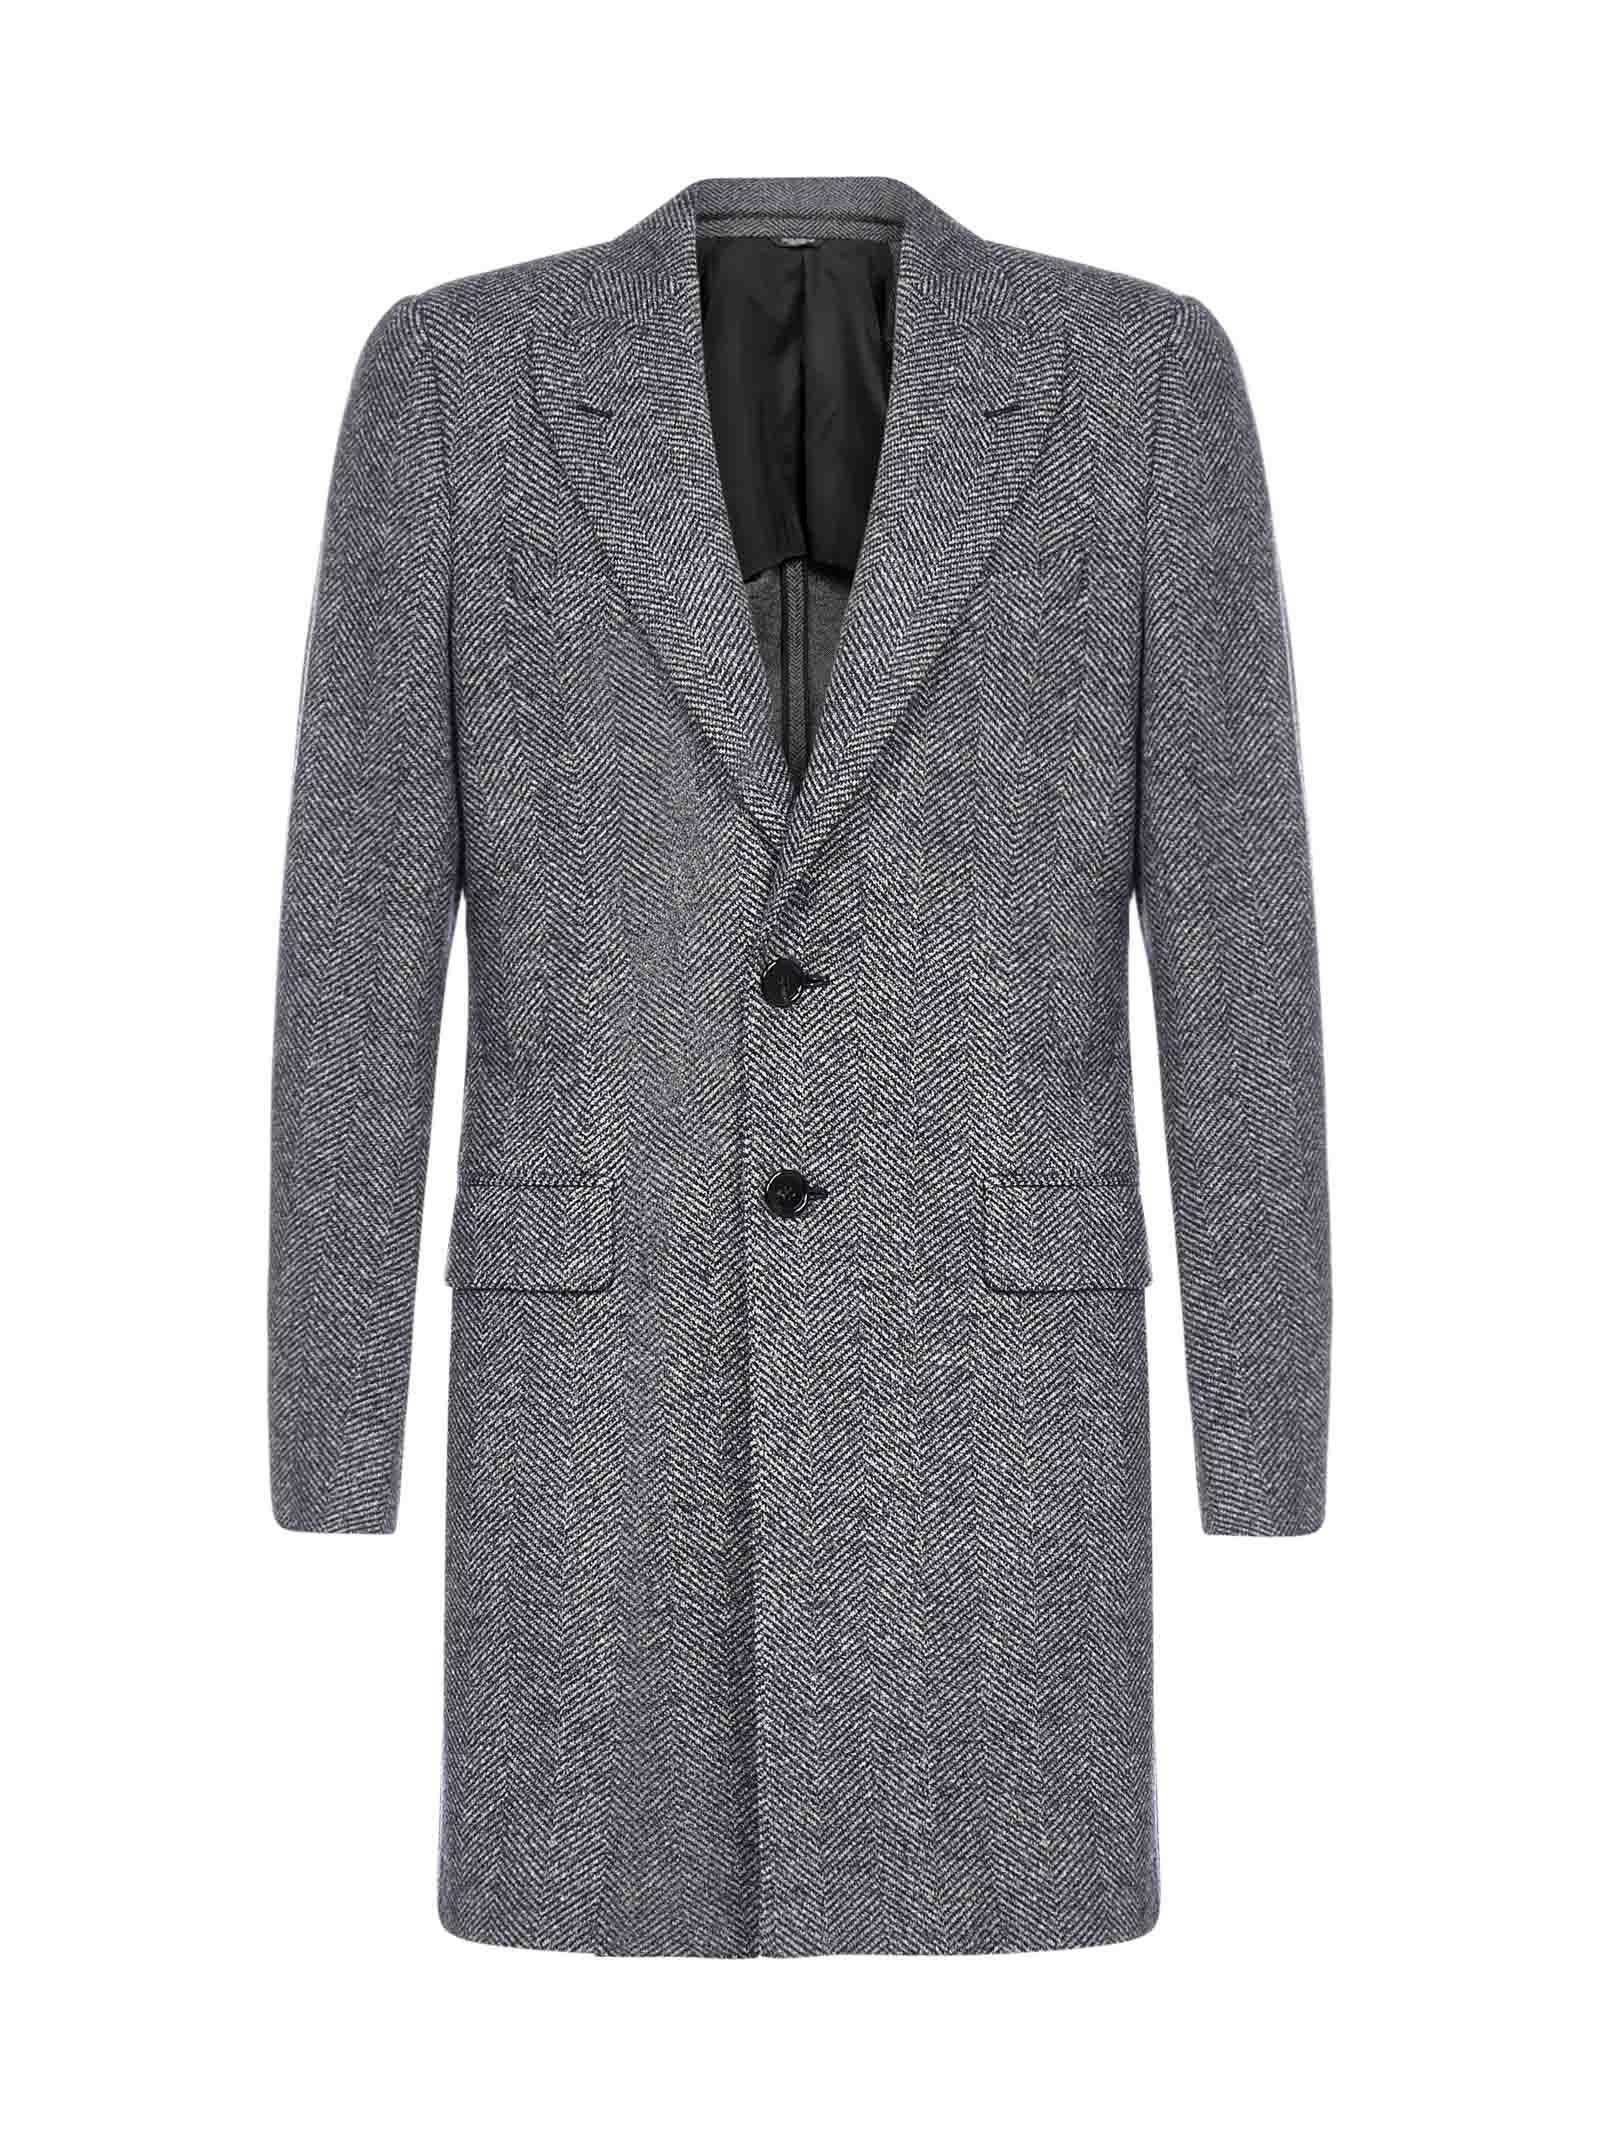 Dolce & Gabbana Chevron Wool Tailored Coat